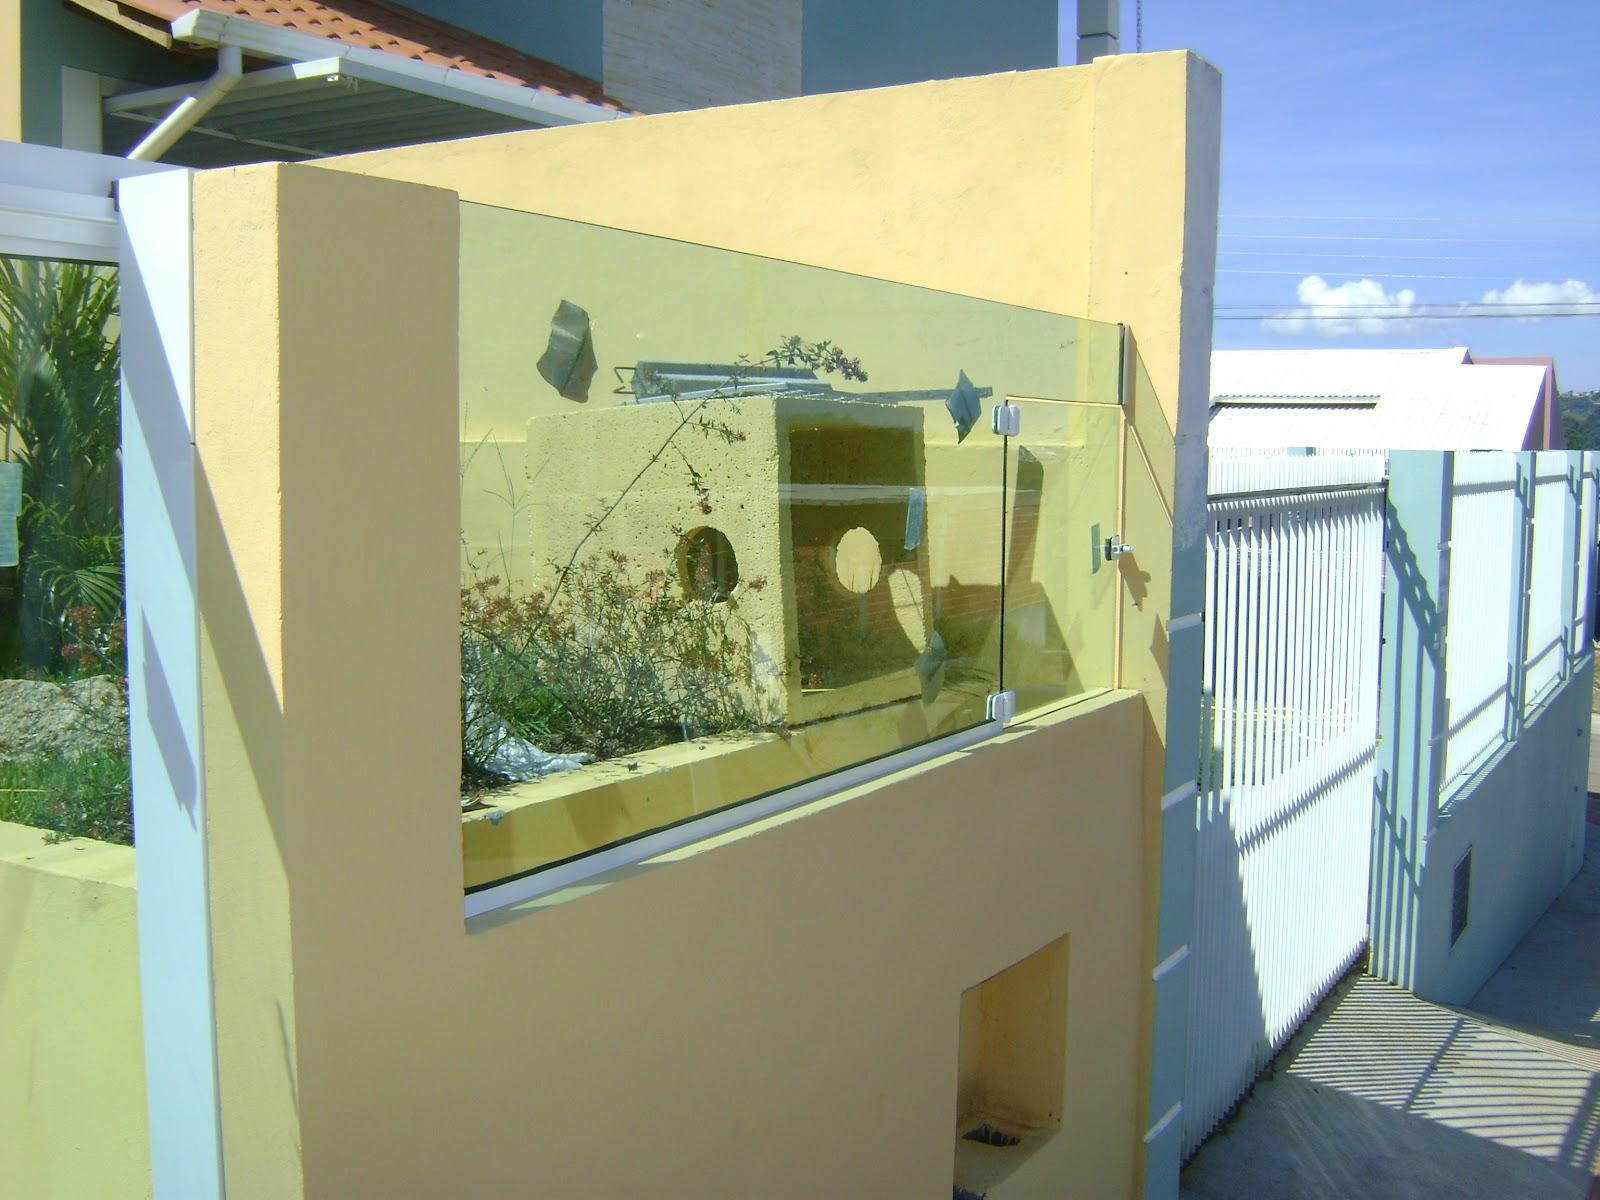 Muro de vidro com lixeira